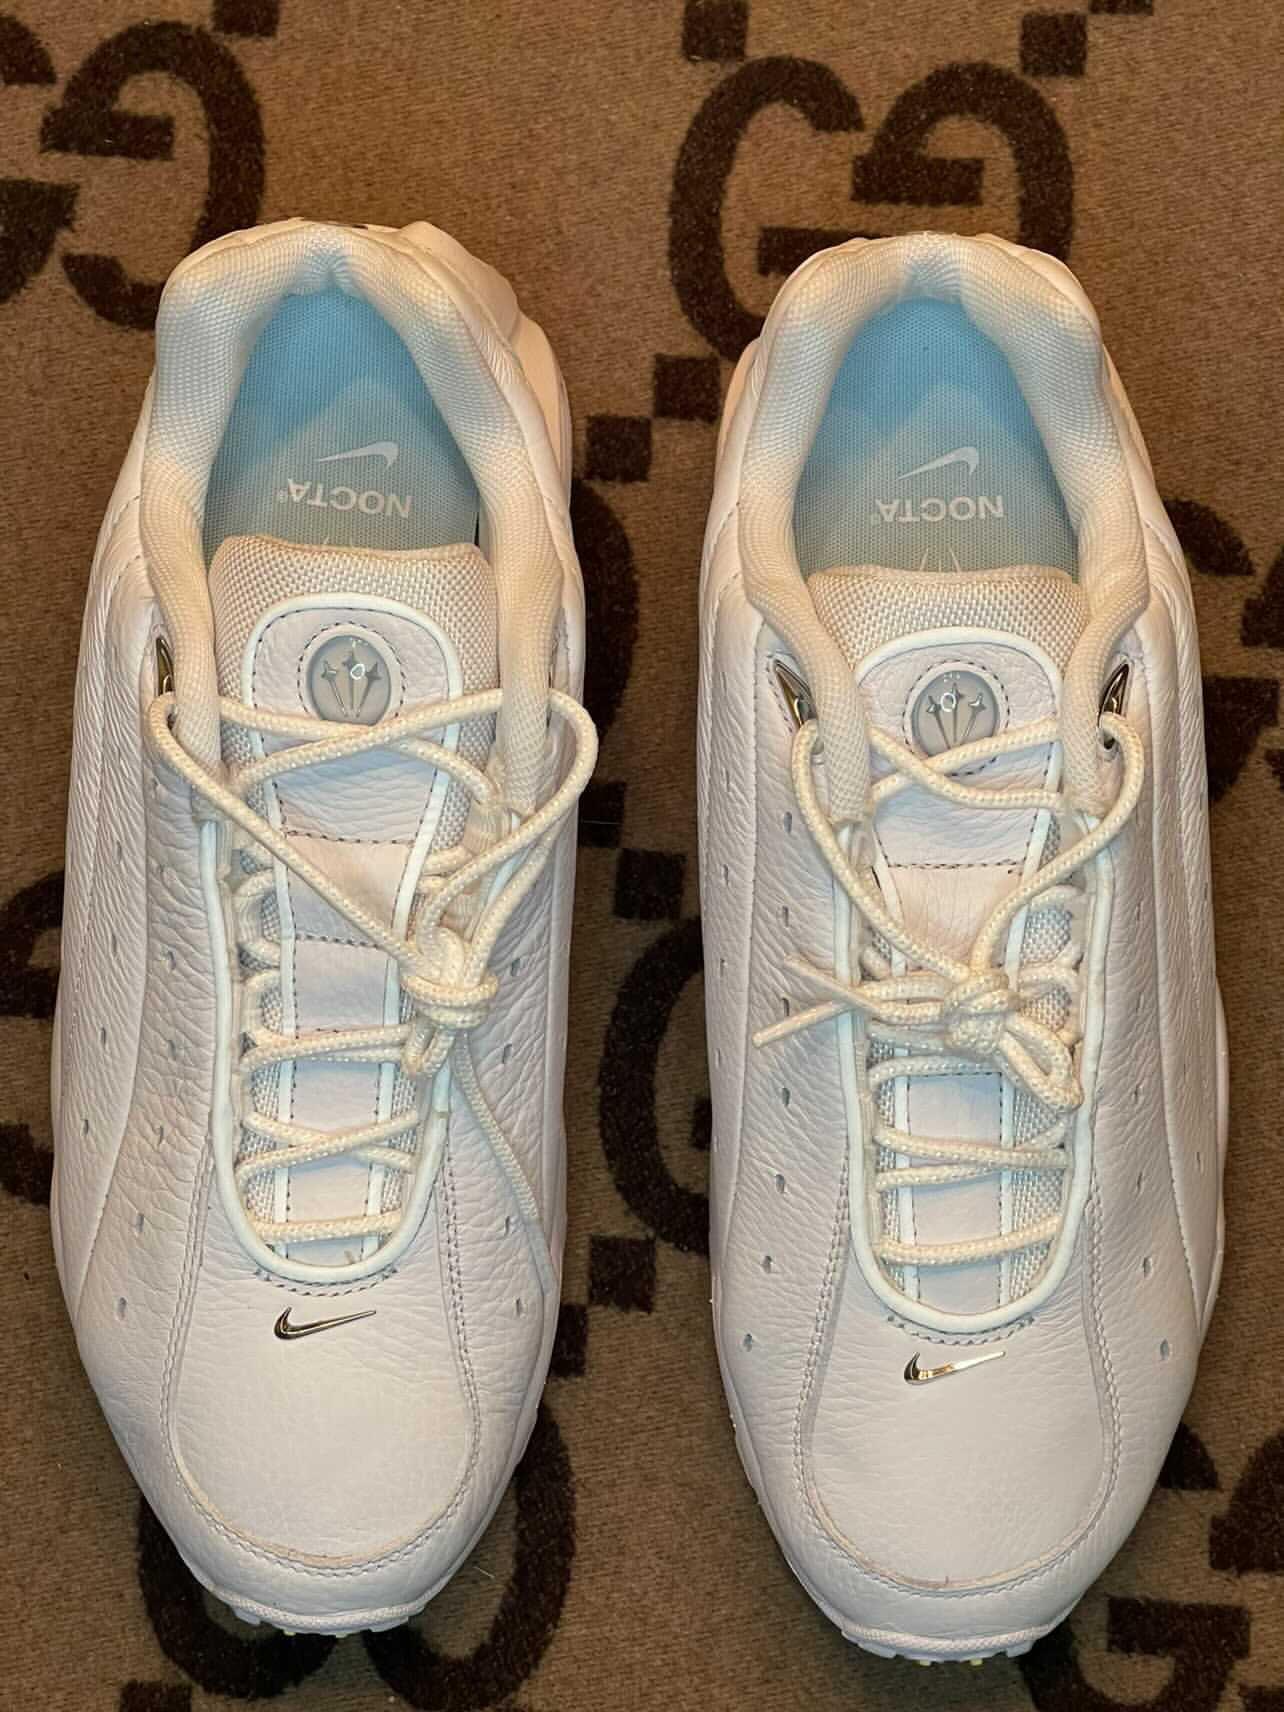 NOCTA,Nike,Drake,DH4692-100,发售  Drake x Nike 联名鞋再曝新配色!终于快要发售了!